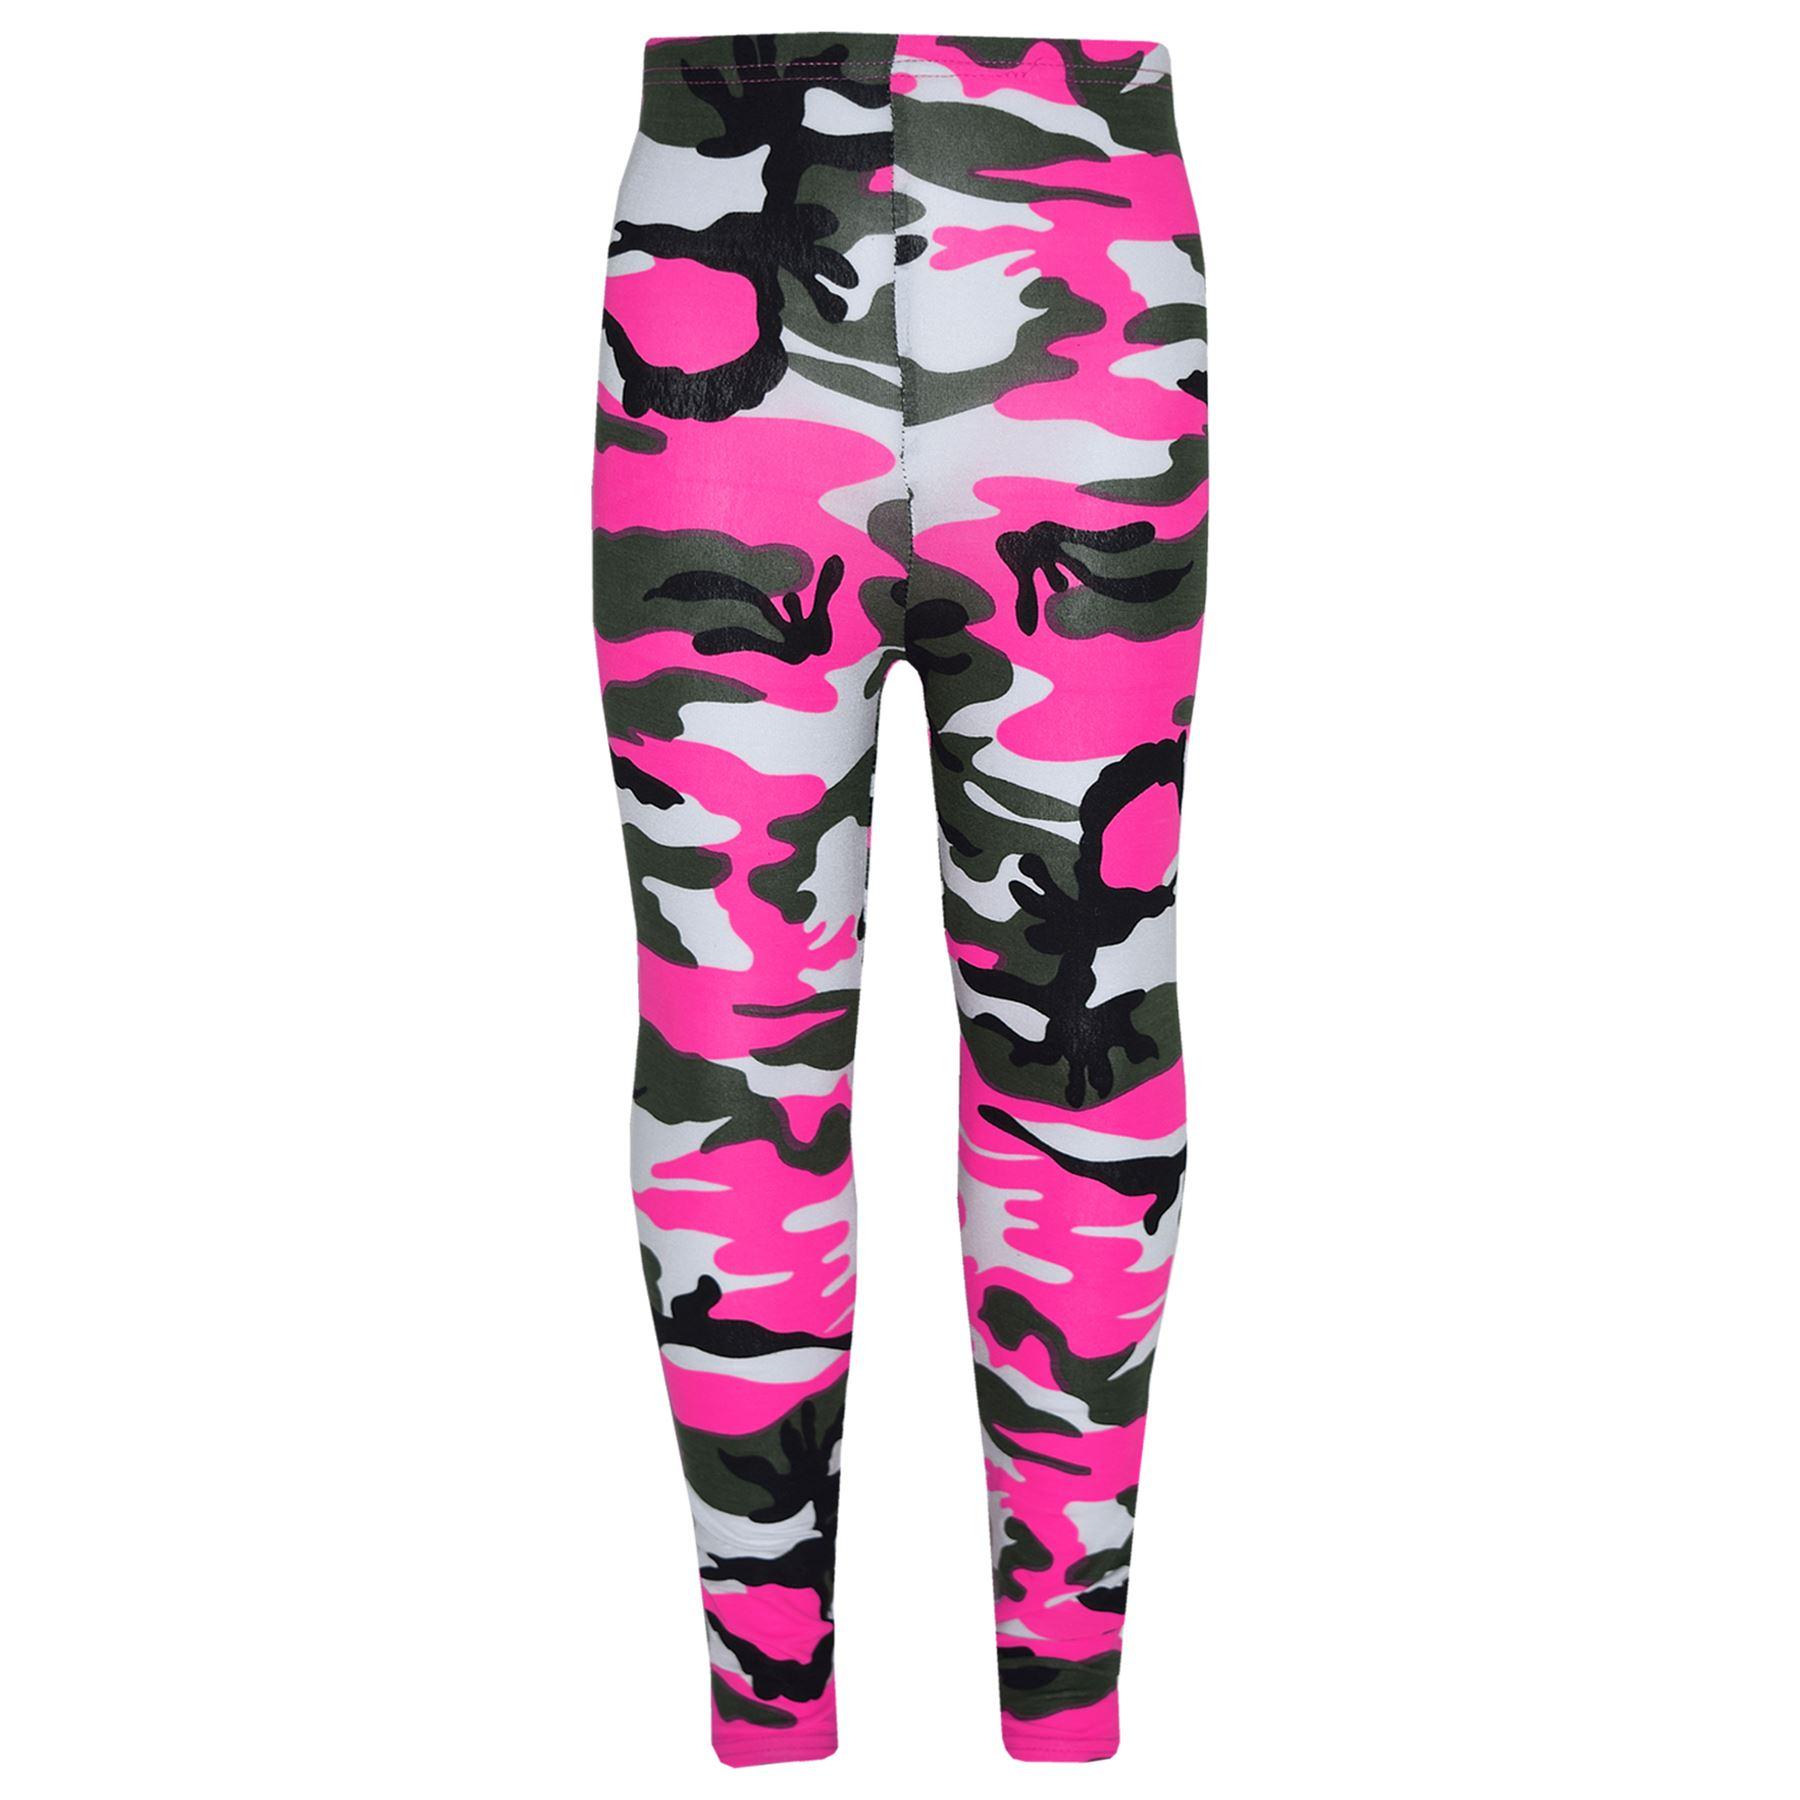 1575bc7e7eba9f Girls Tops Kids Camouflage Print Trendy Crop Top & Legging Set Age 7 ...